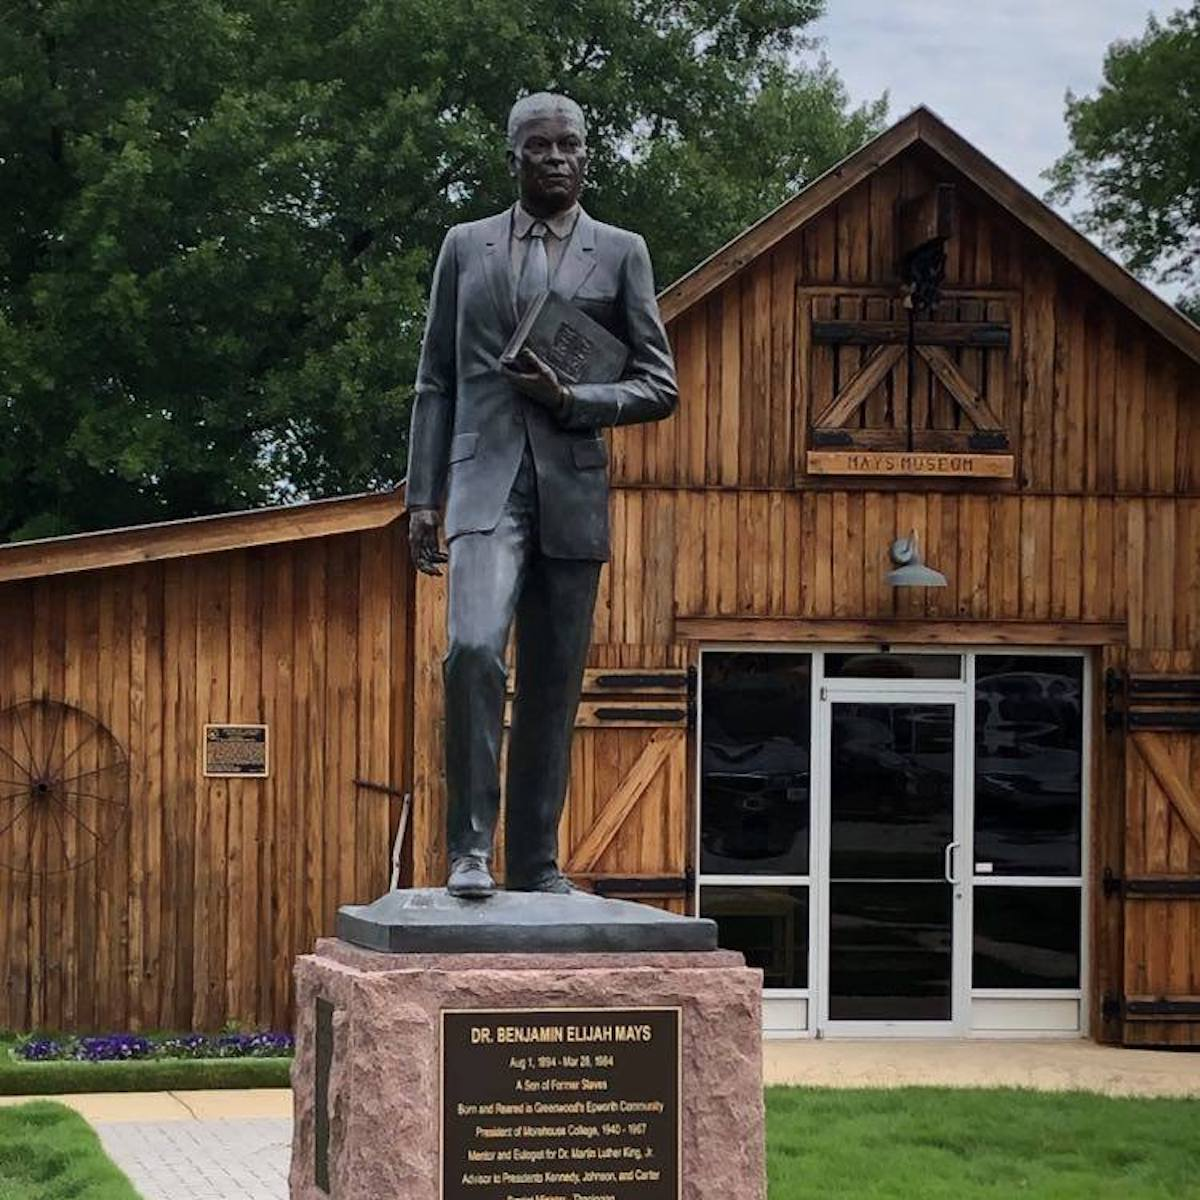 Dr. Benjamin E. Mays Historic Preservation Site